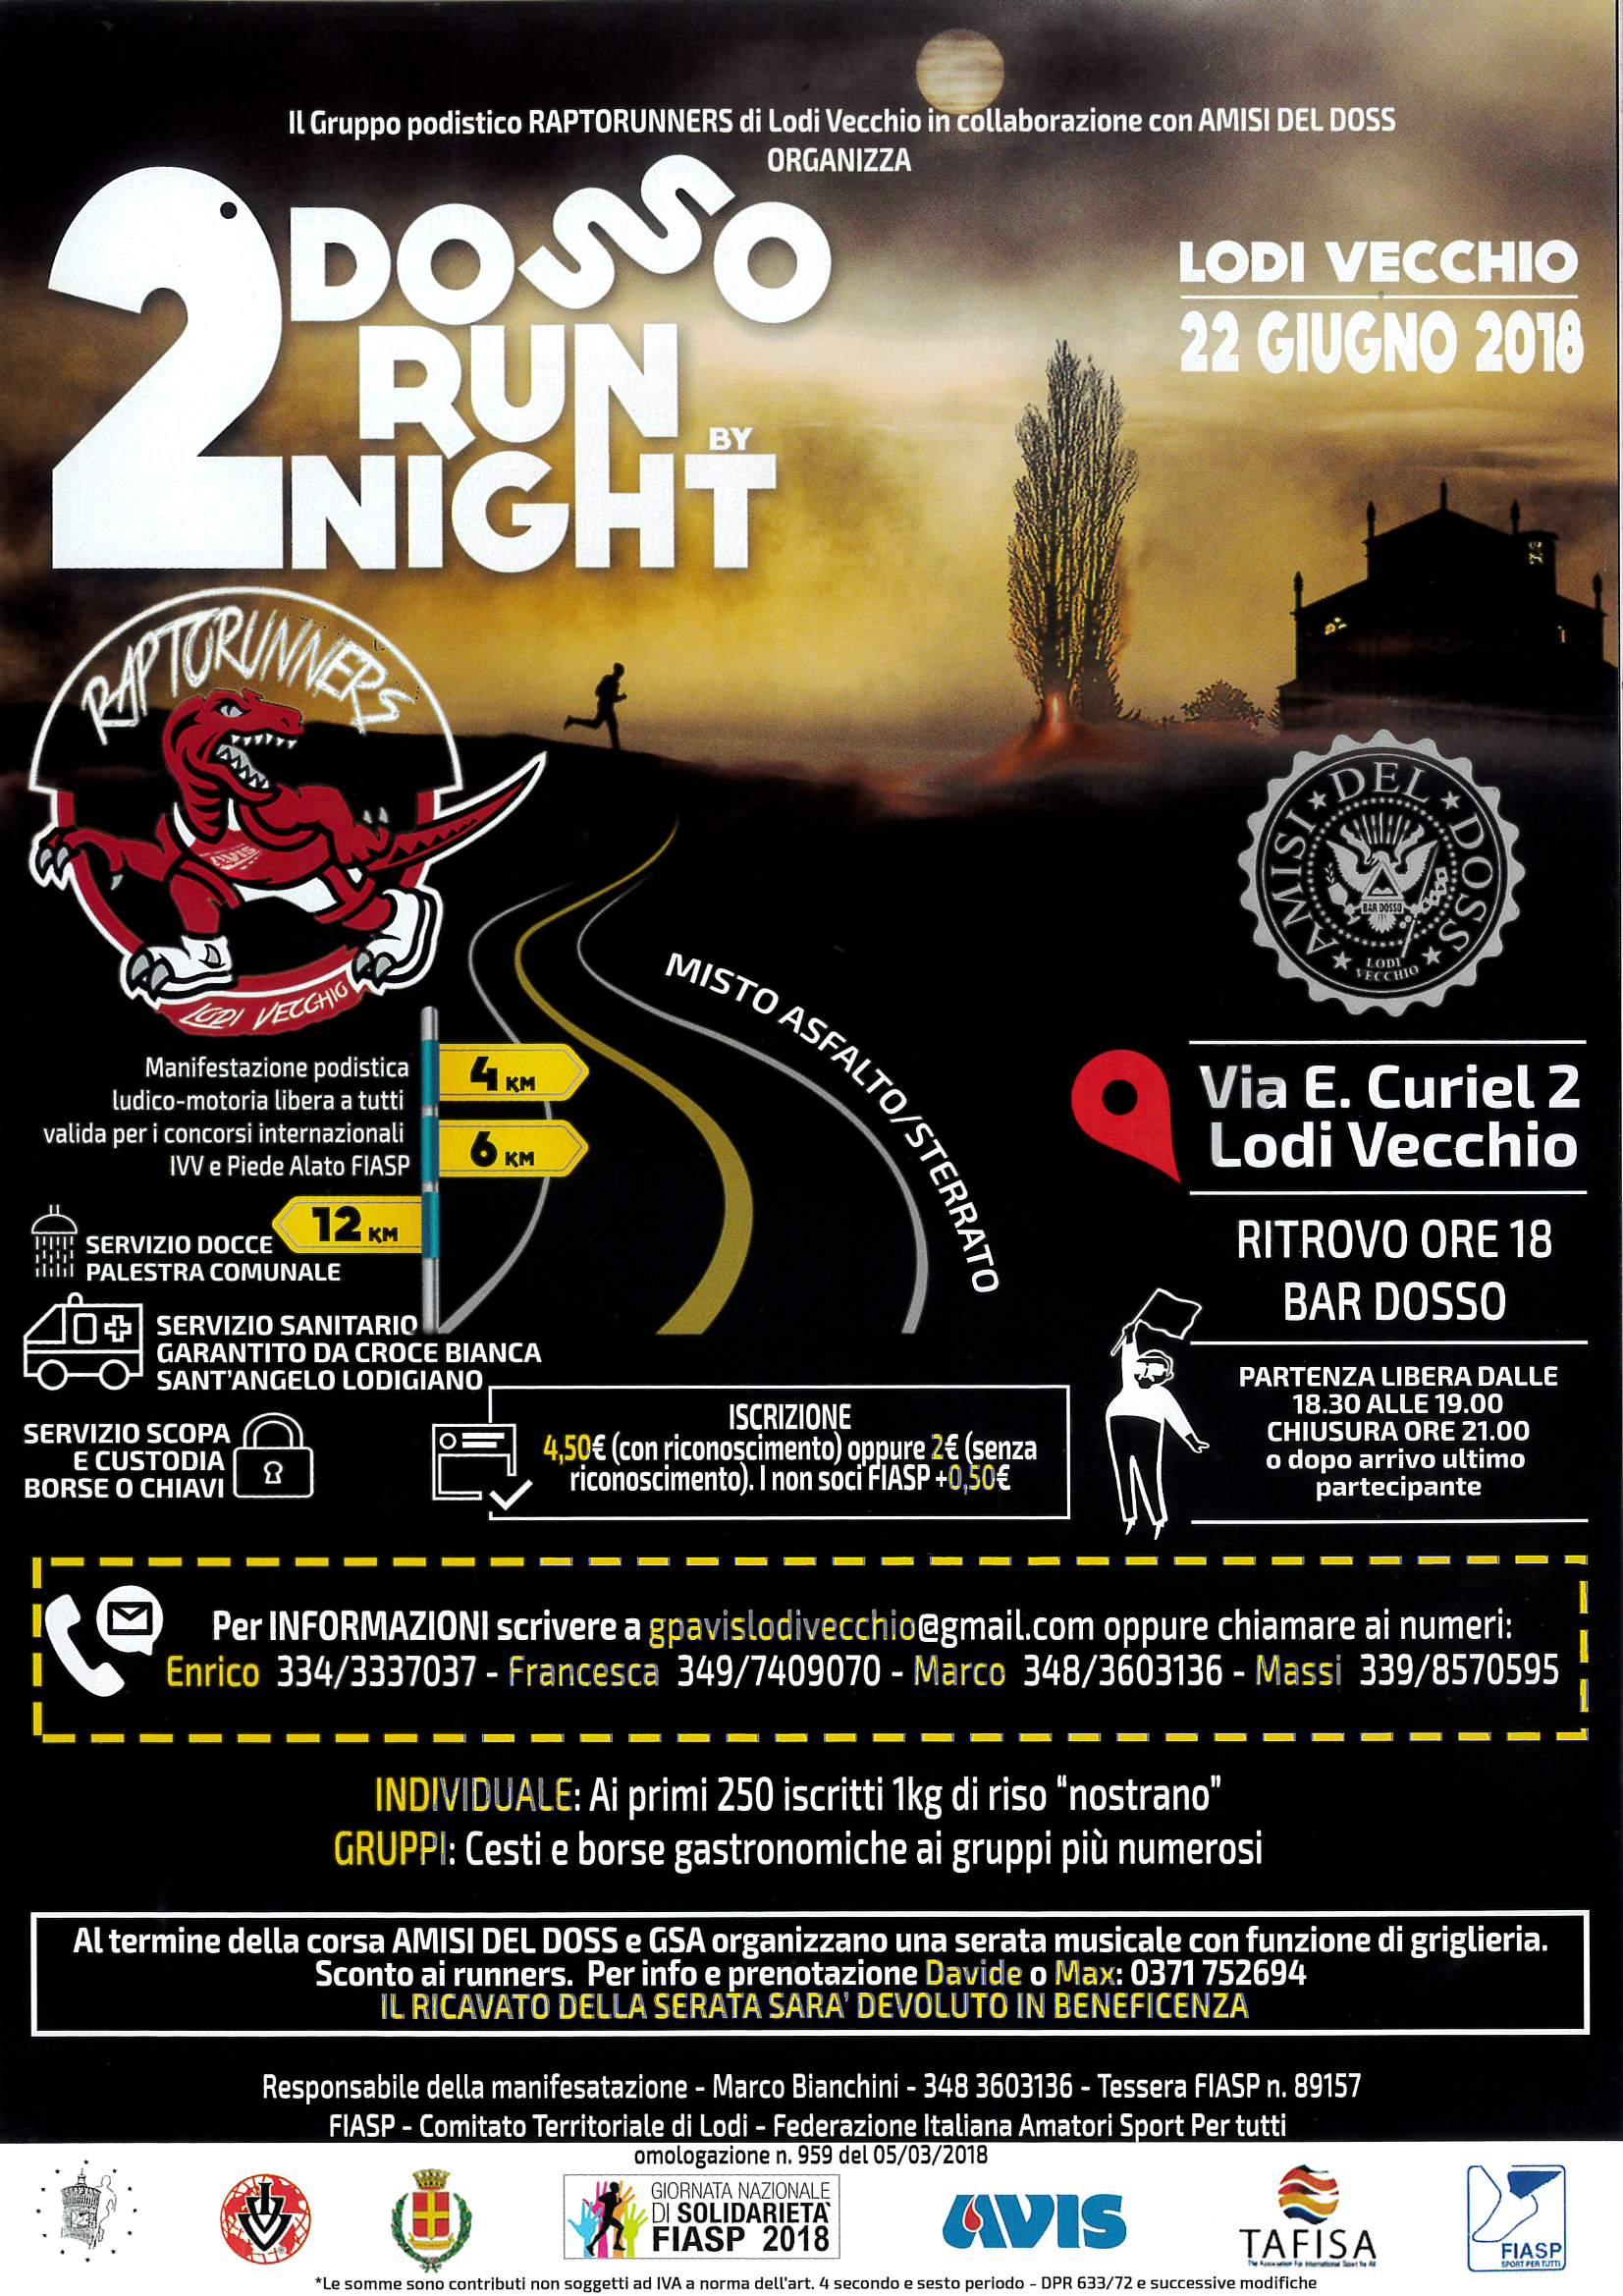 Dosso run night